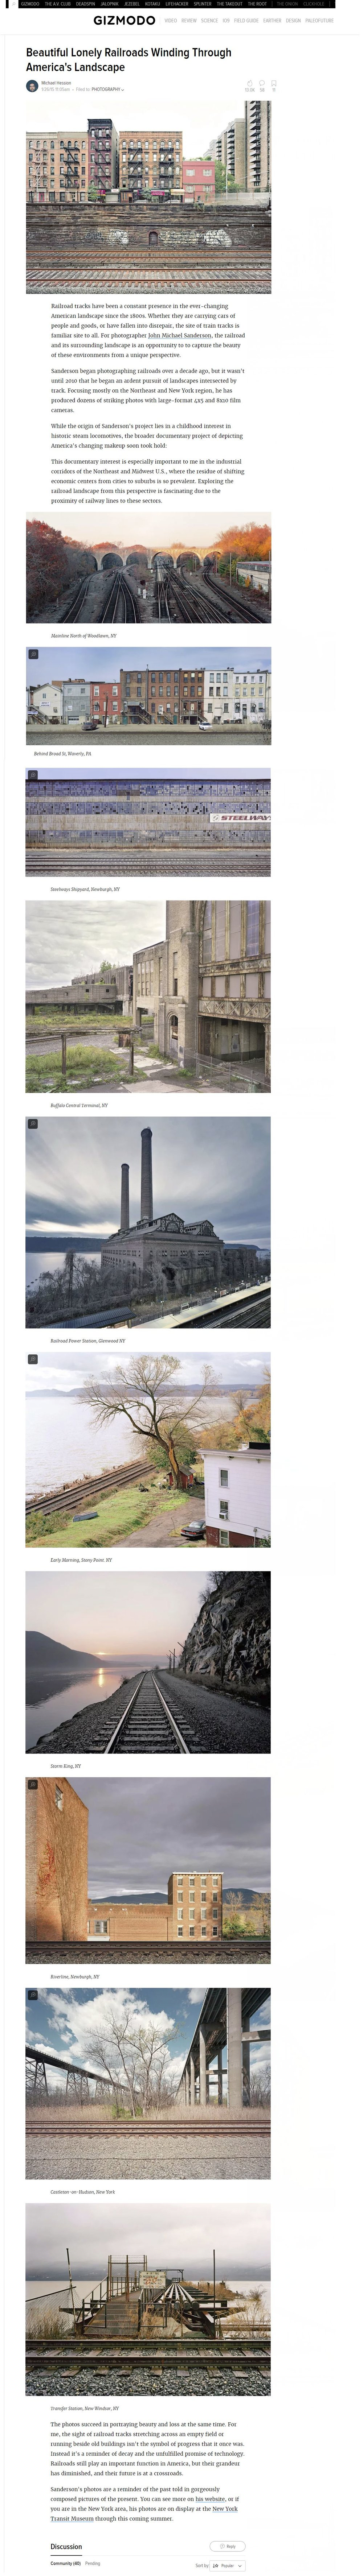 01-26-2015_Beautiful Lonely Railroads Winding Through America's Landscape_Gizmodo.jpg